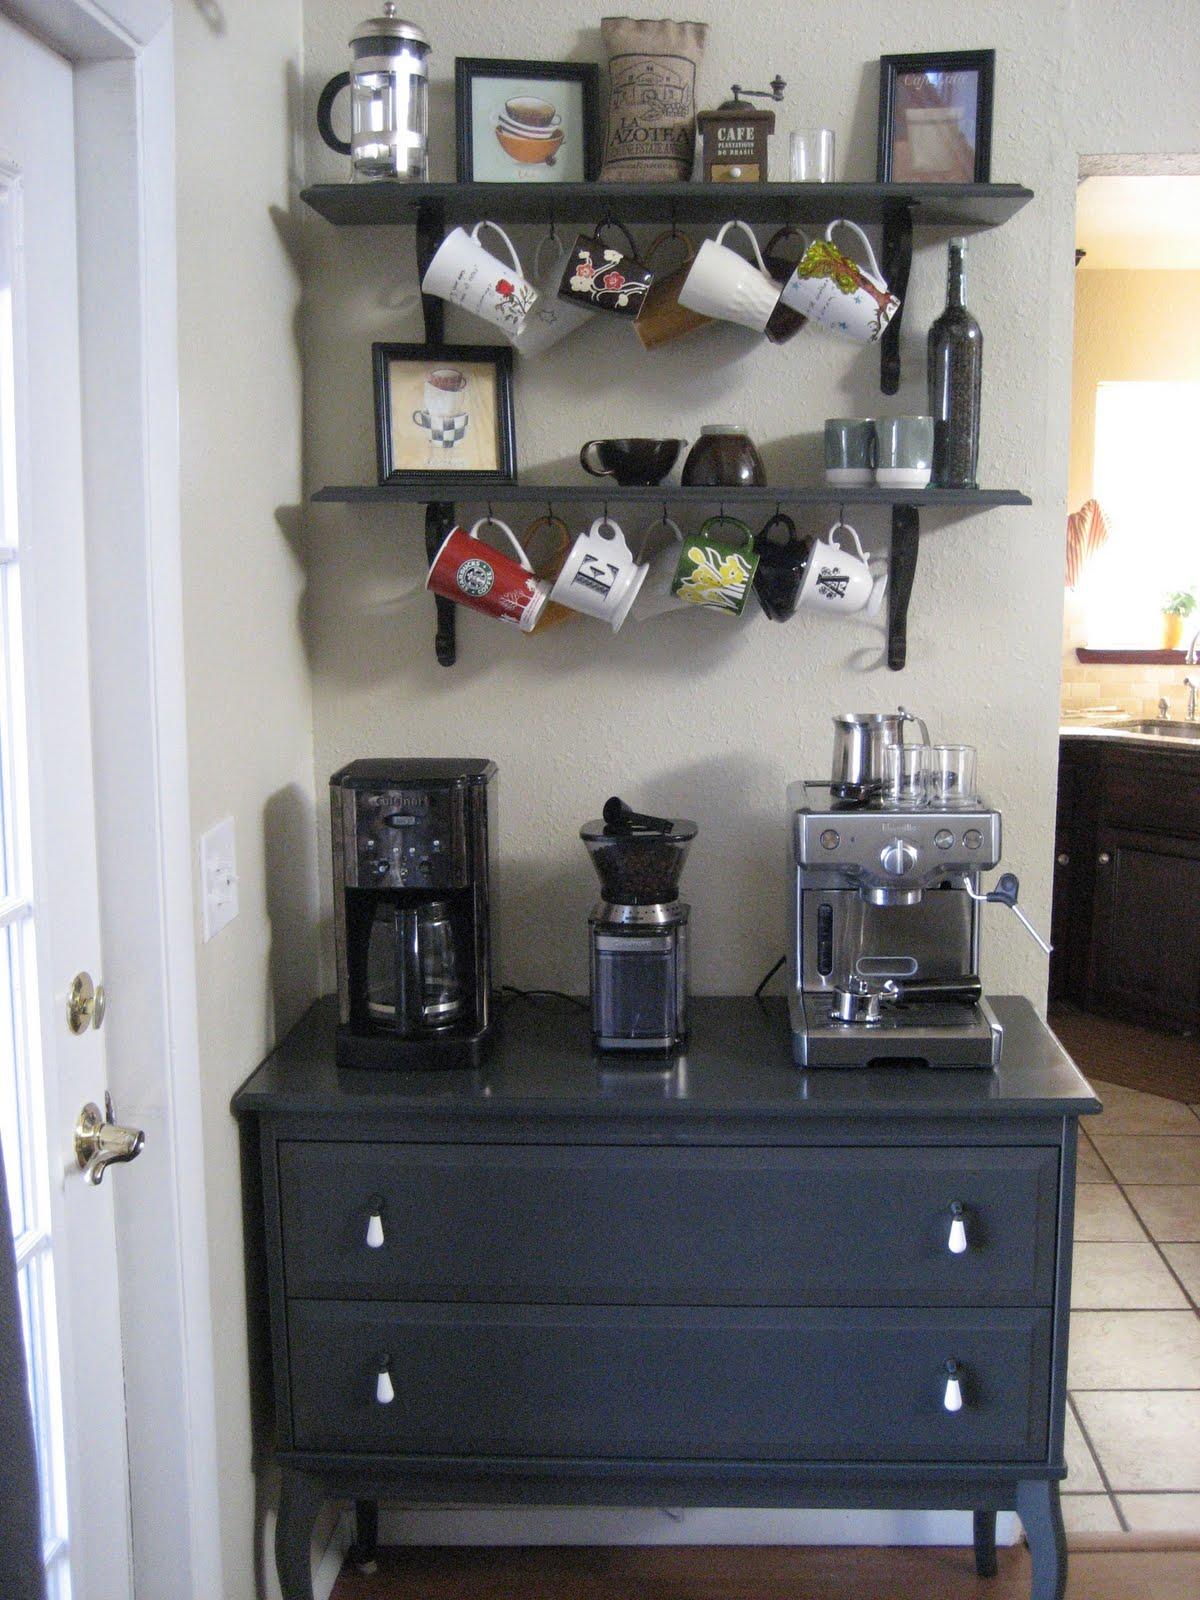 The Coffee Bar - Take 2 | The Cream to My Coffee